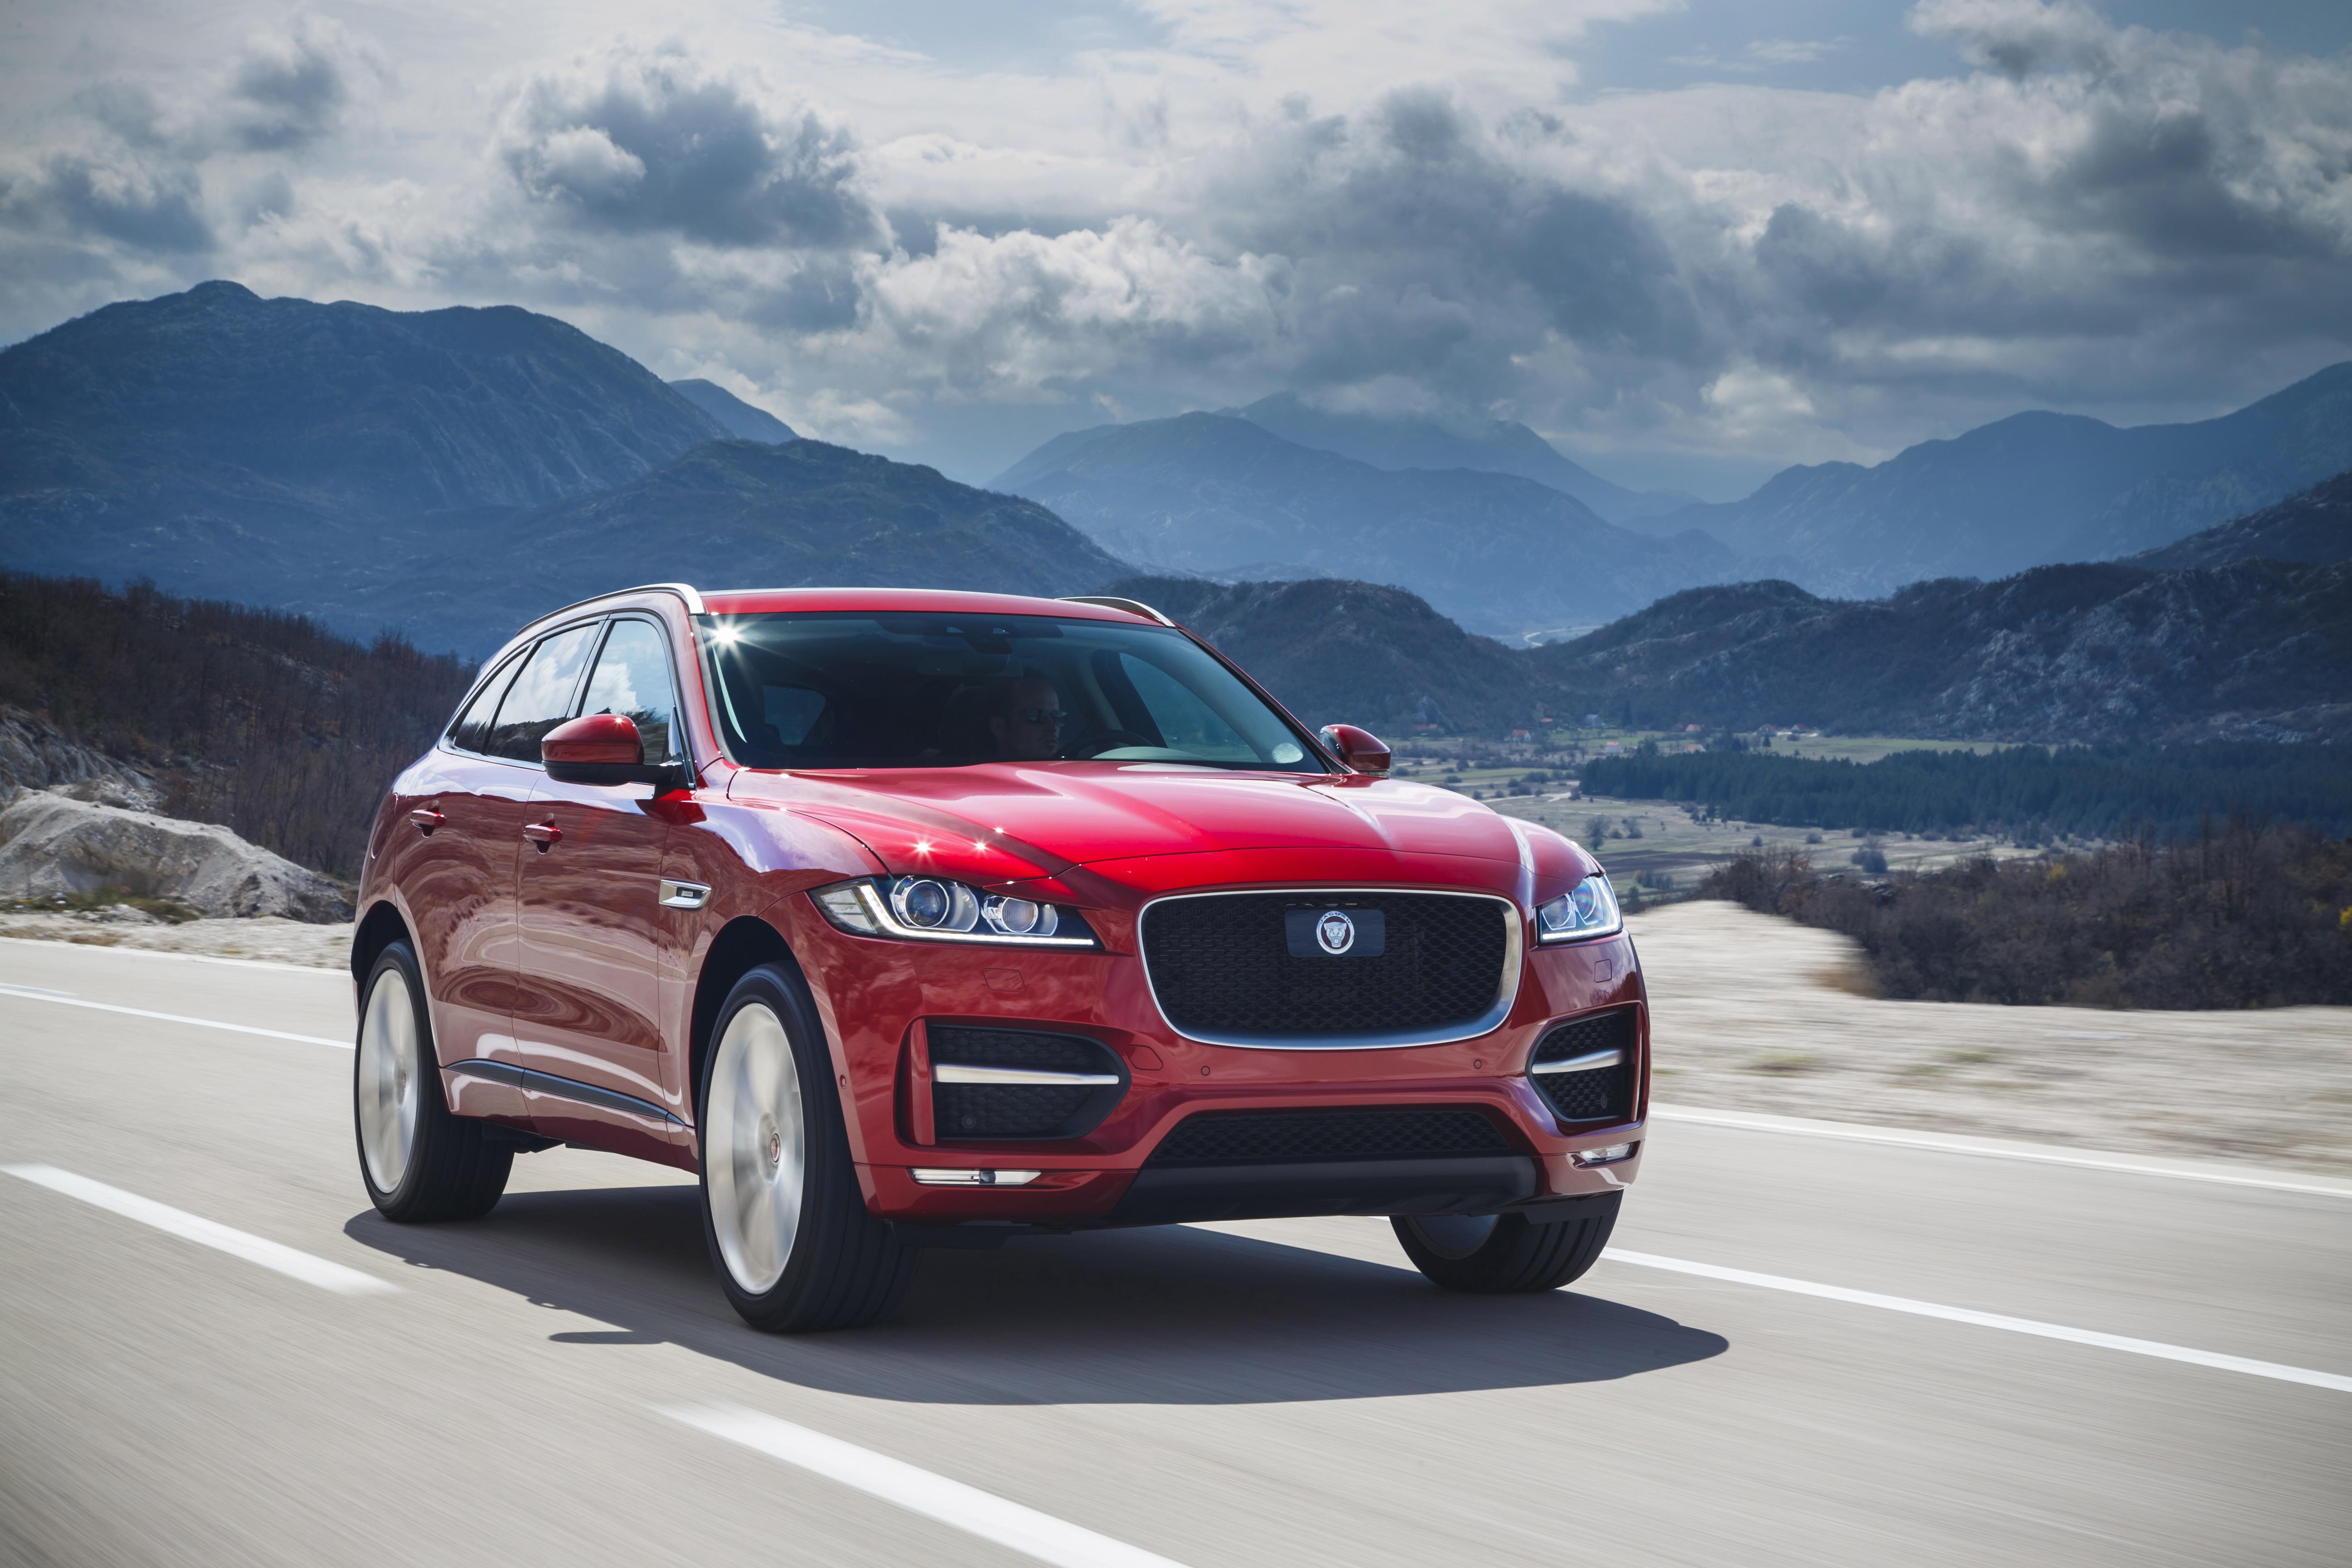 Jaguar F-Pace SUVs Recalled for Instrument Cluster